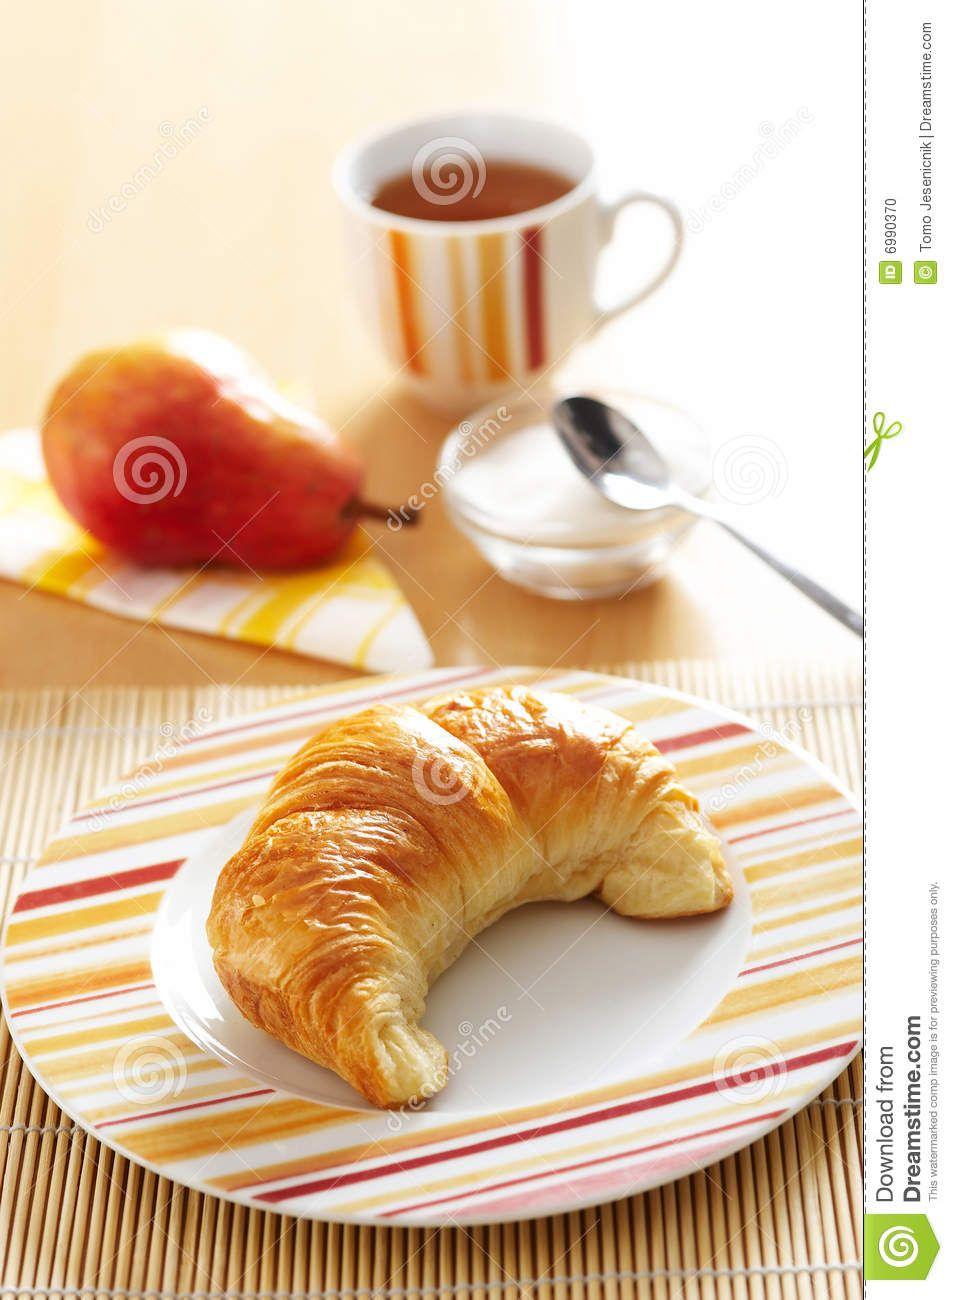 Risultati immagini per croissant francese